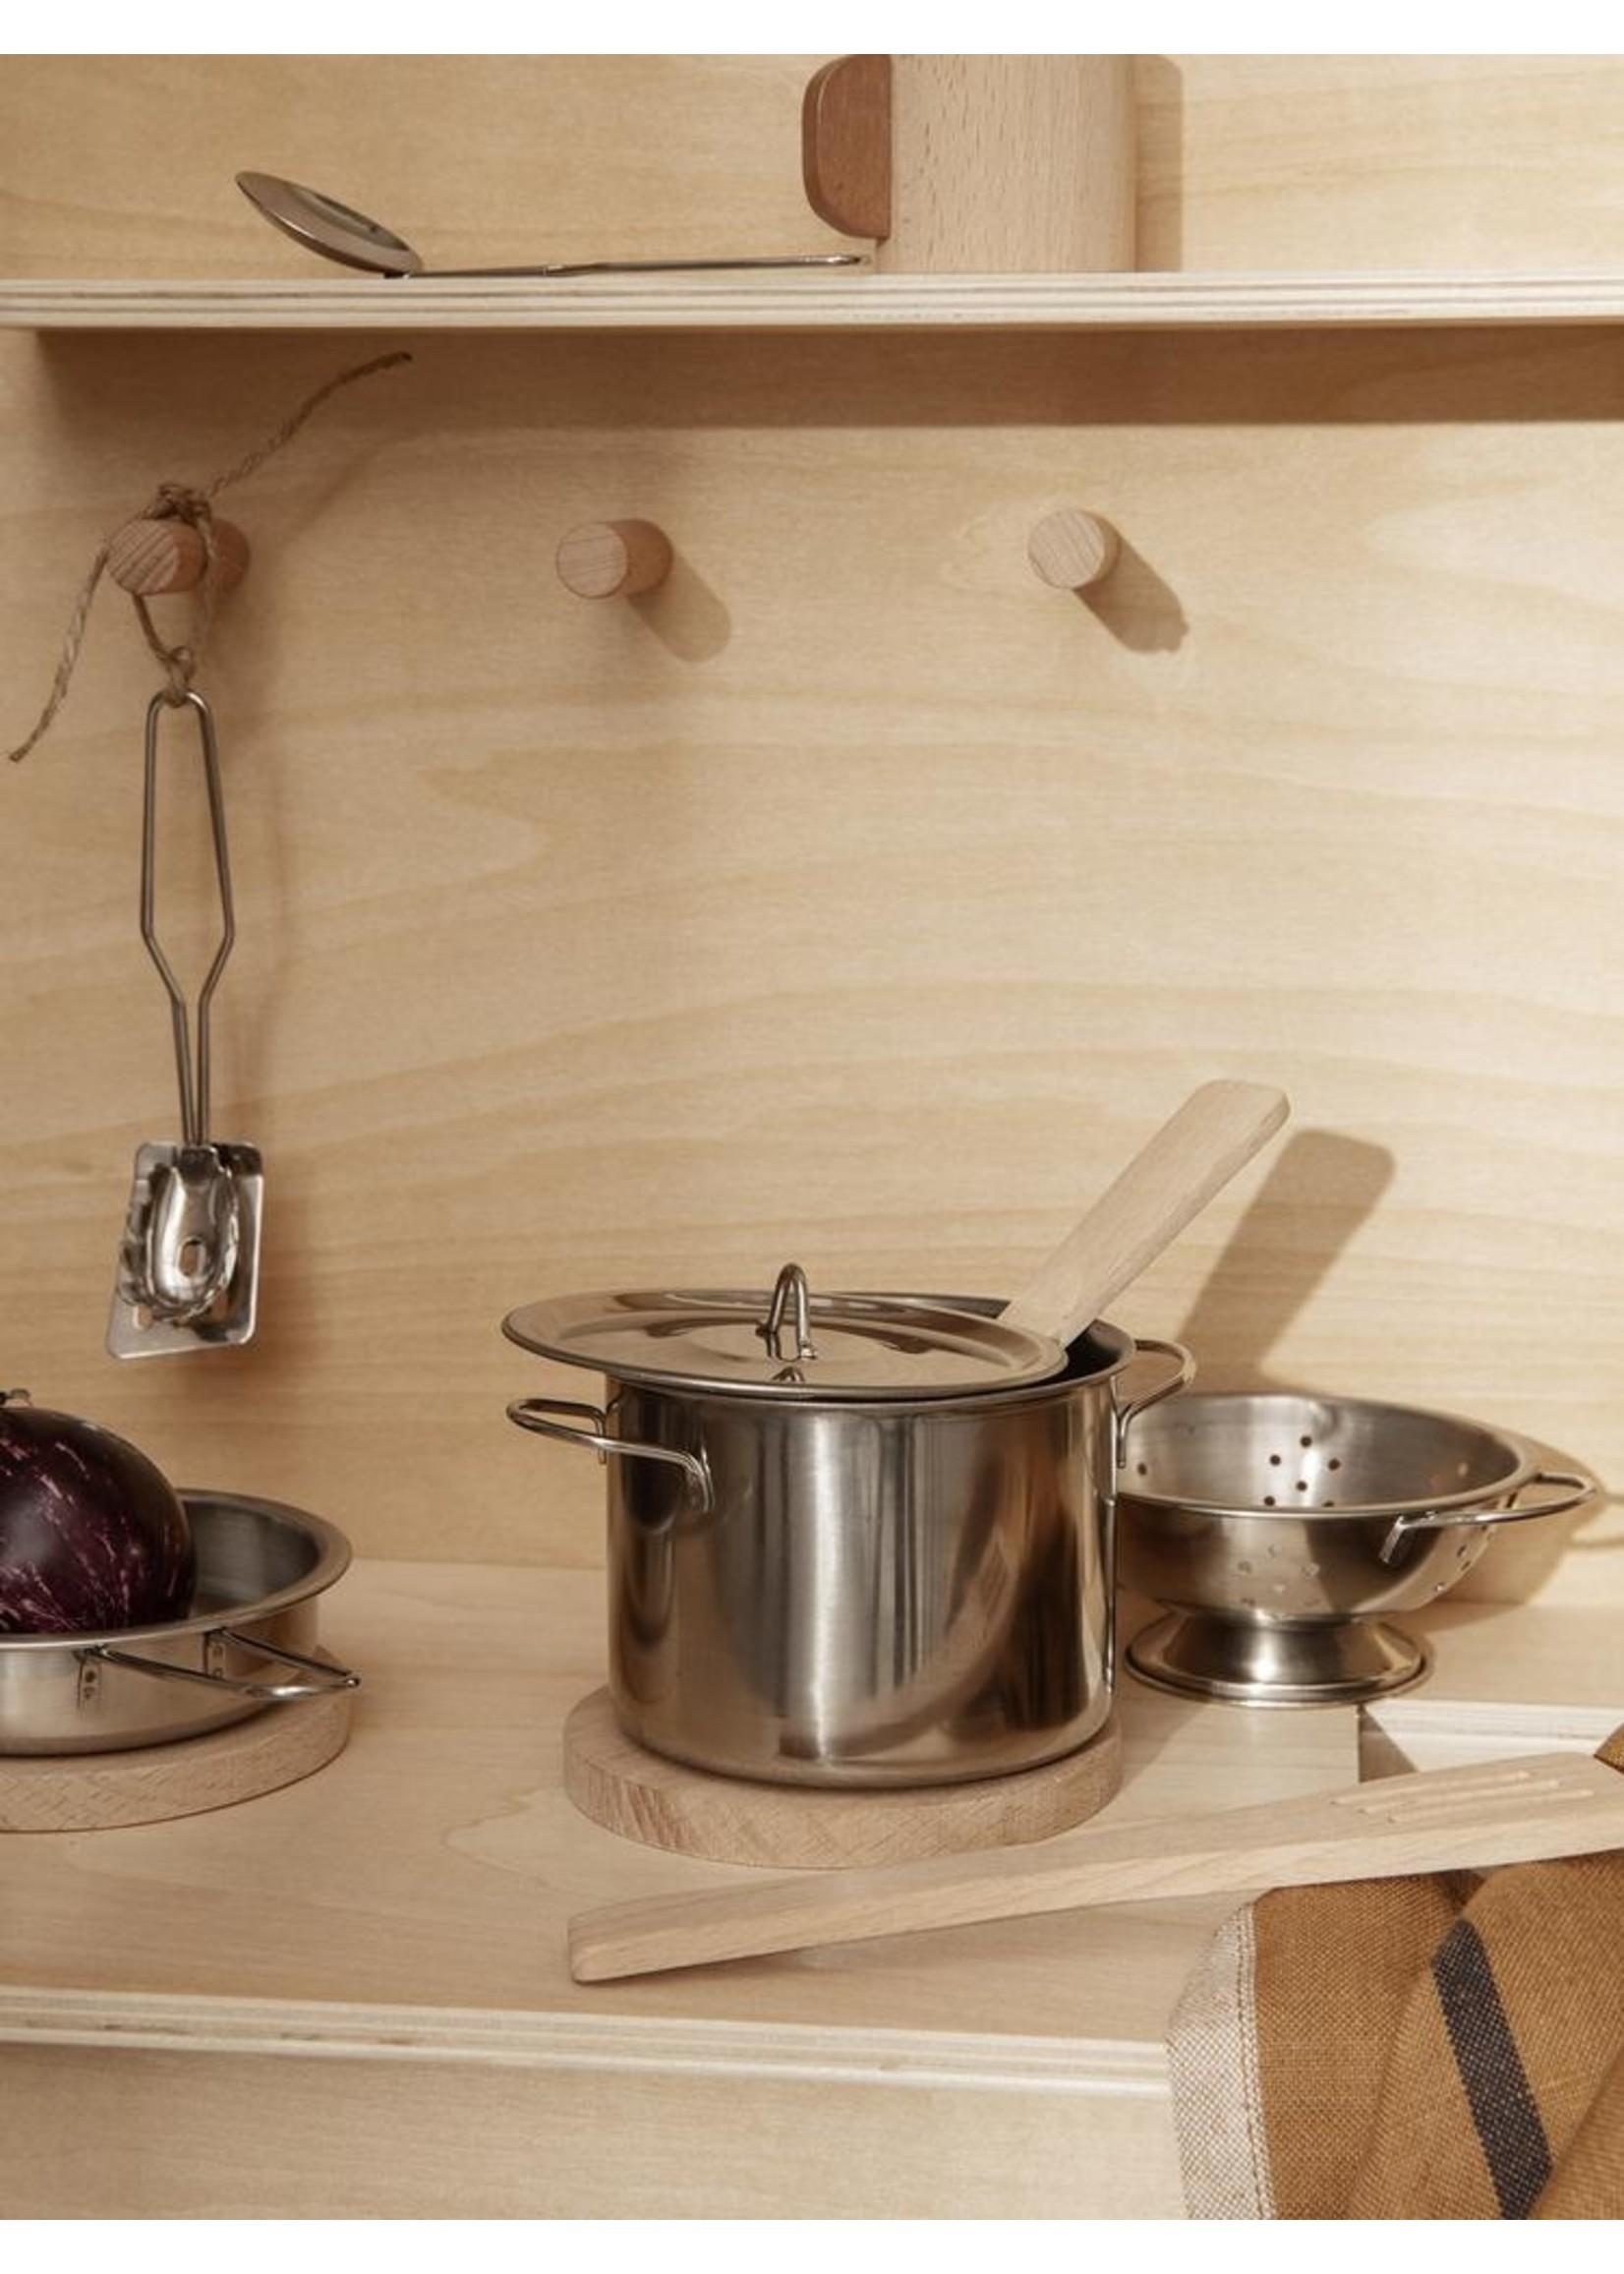 ferm LIVING Ferm Living Toro Play Kitchen Tools - Set of 9